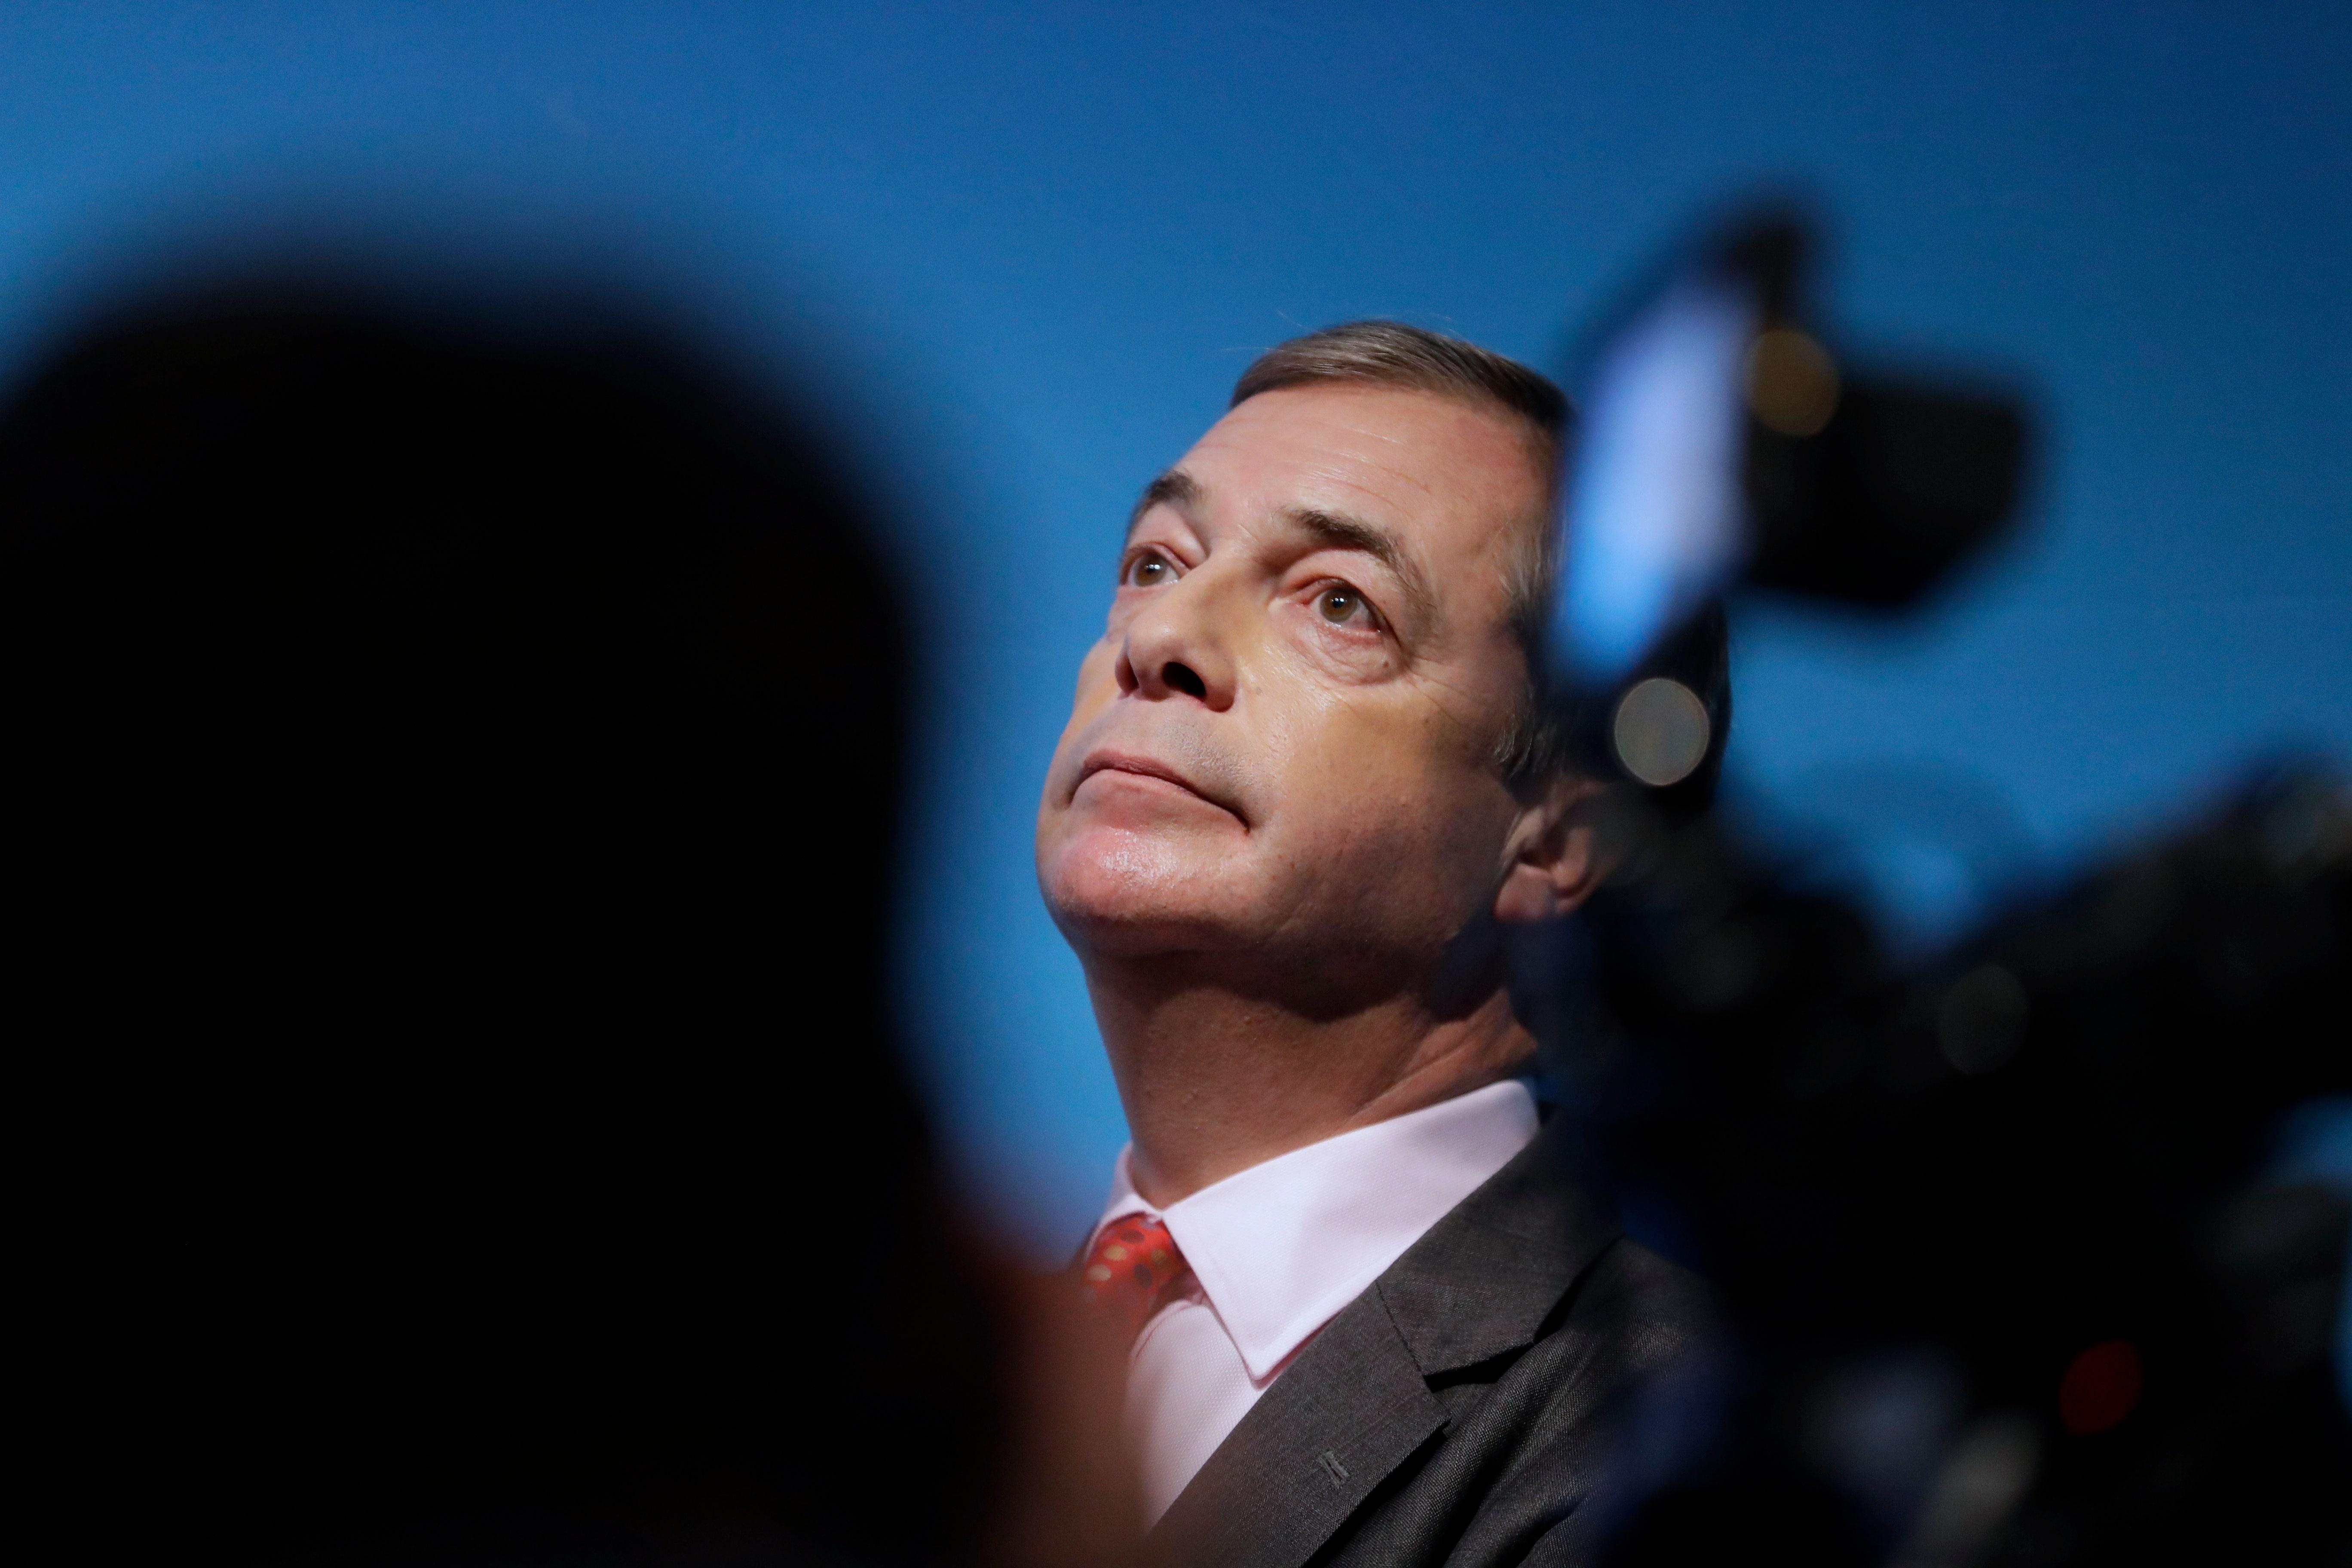 Struggling channel GB News hires Nigel Farage to host show